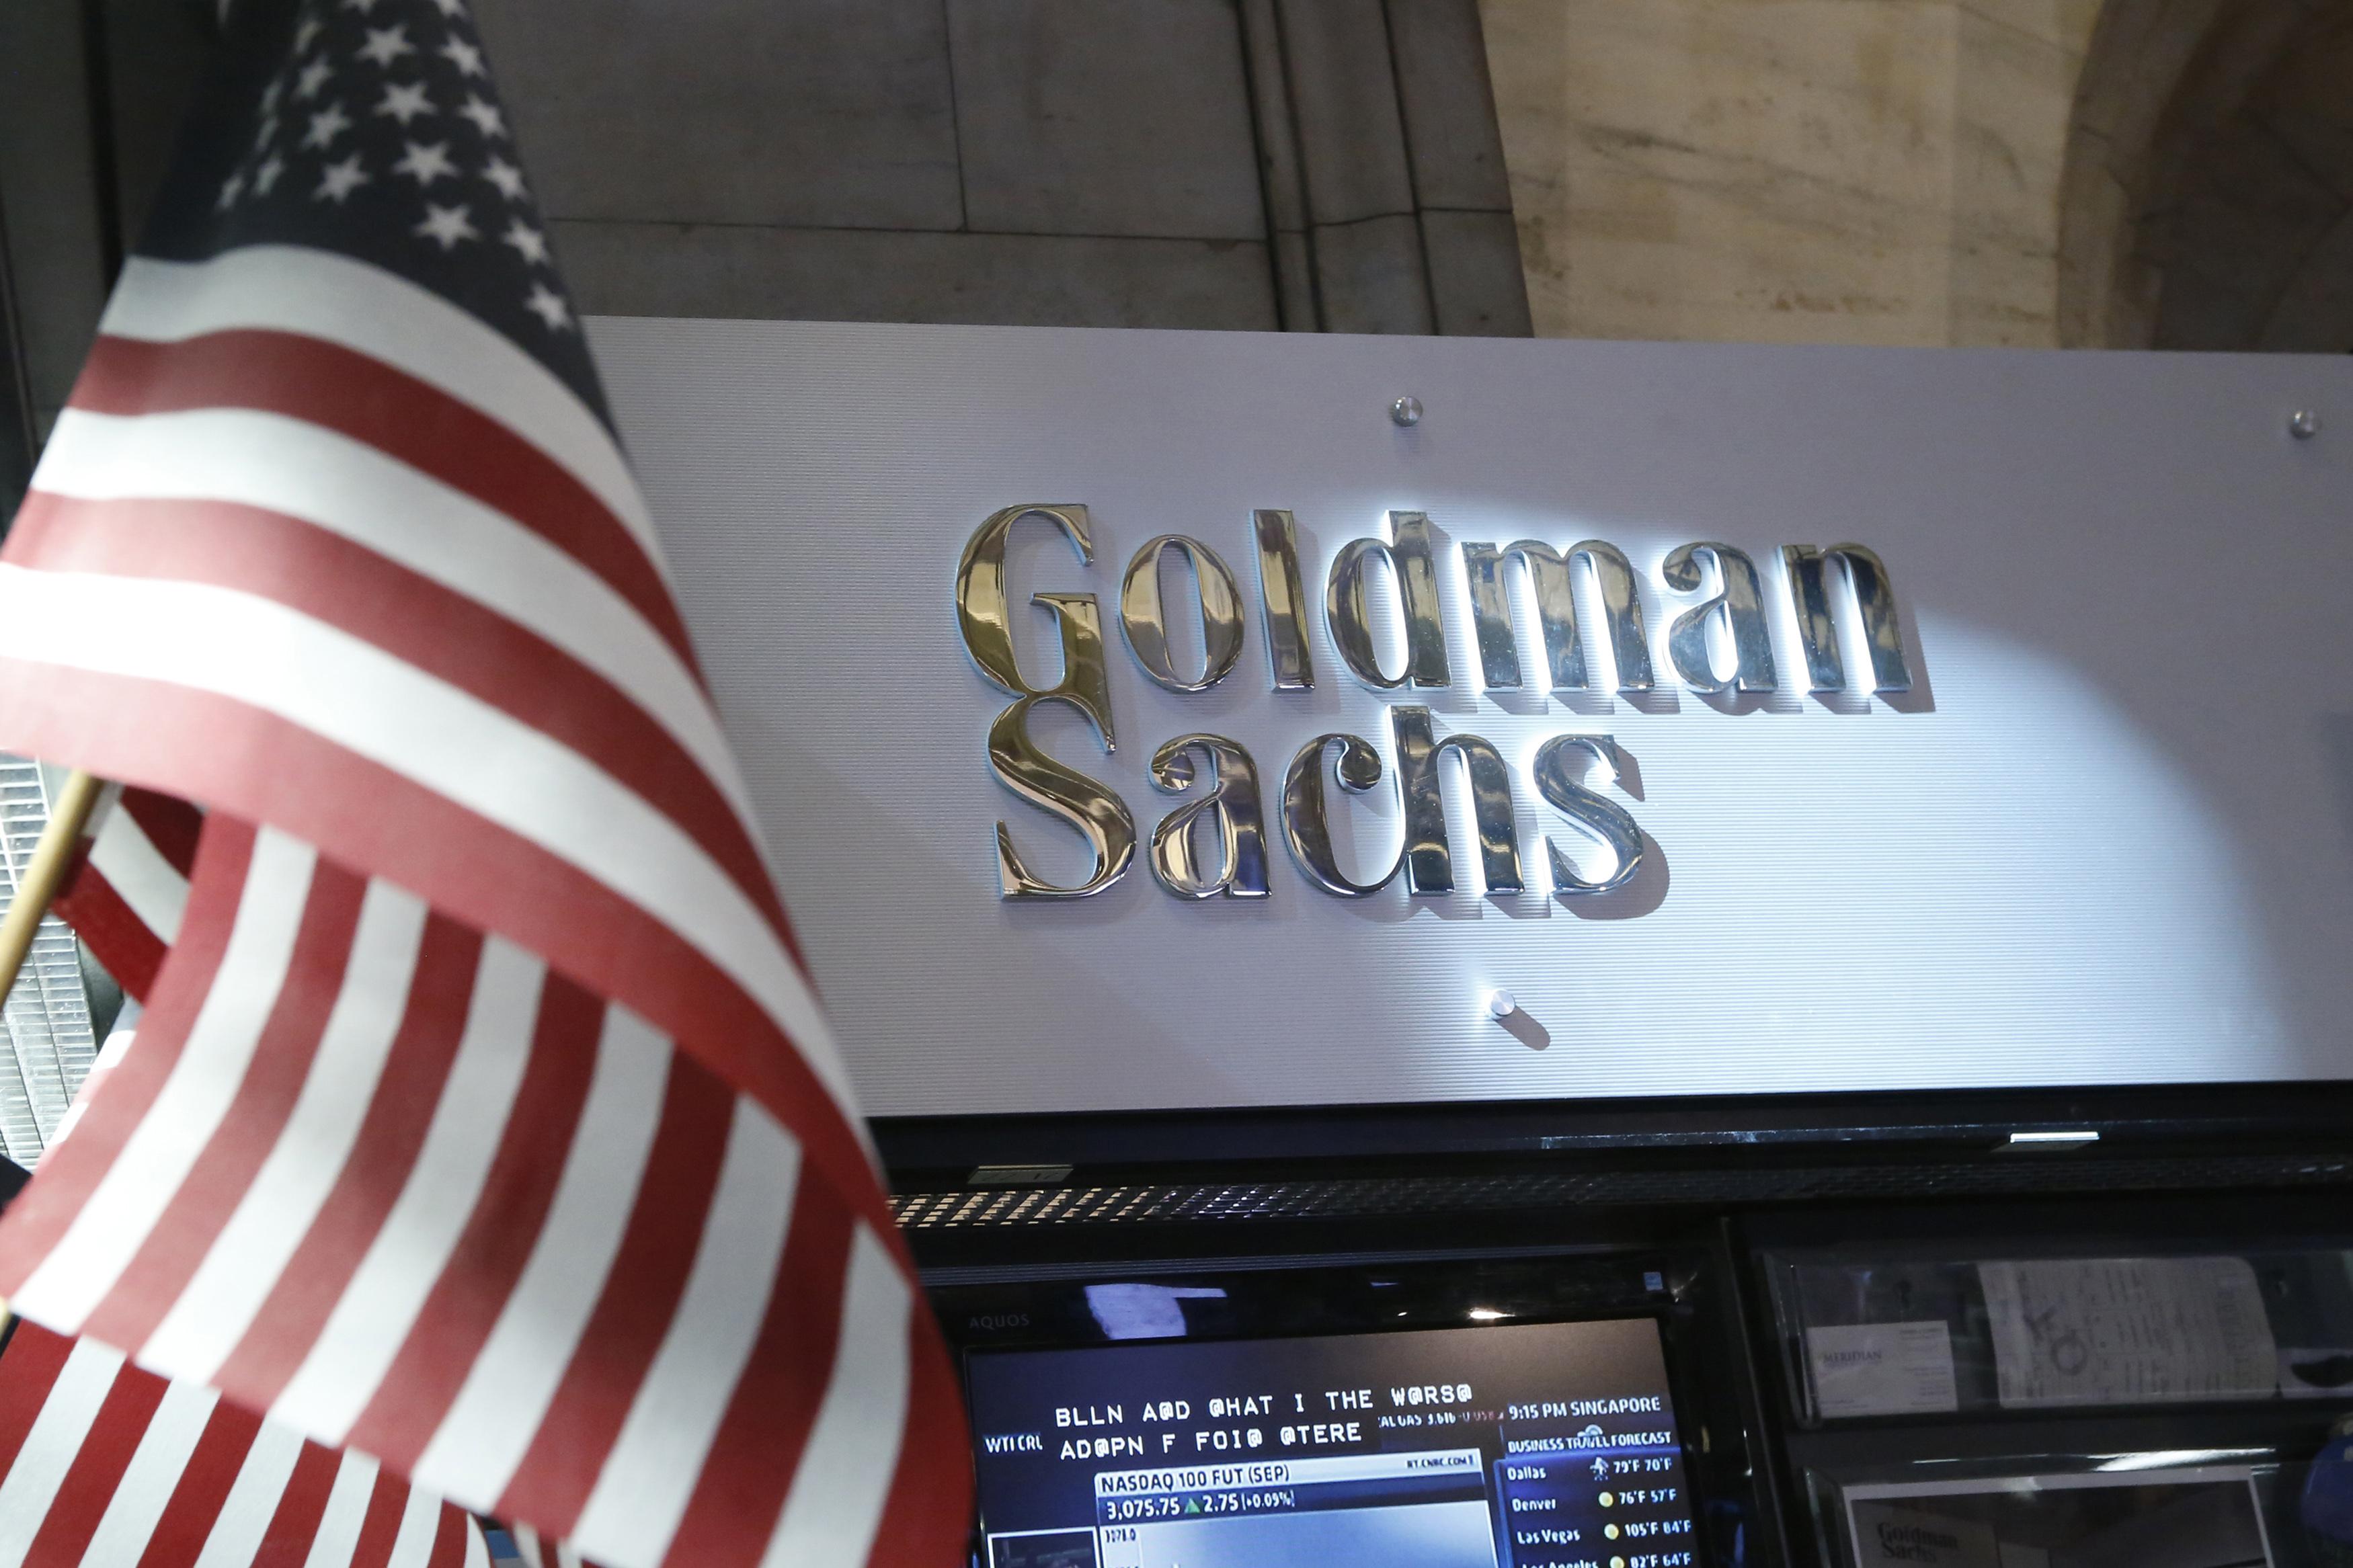 goldman-sachs-va-acheter-capital-vision-services-un-accord-a-2-7-milliards-de-dollars